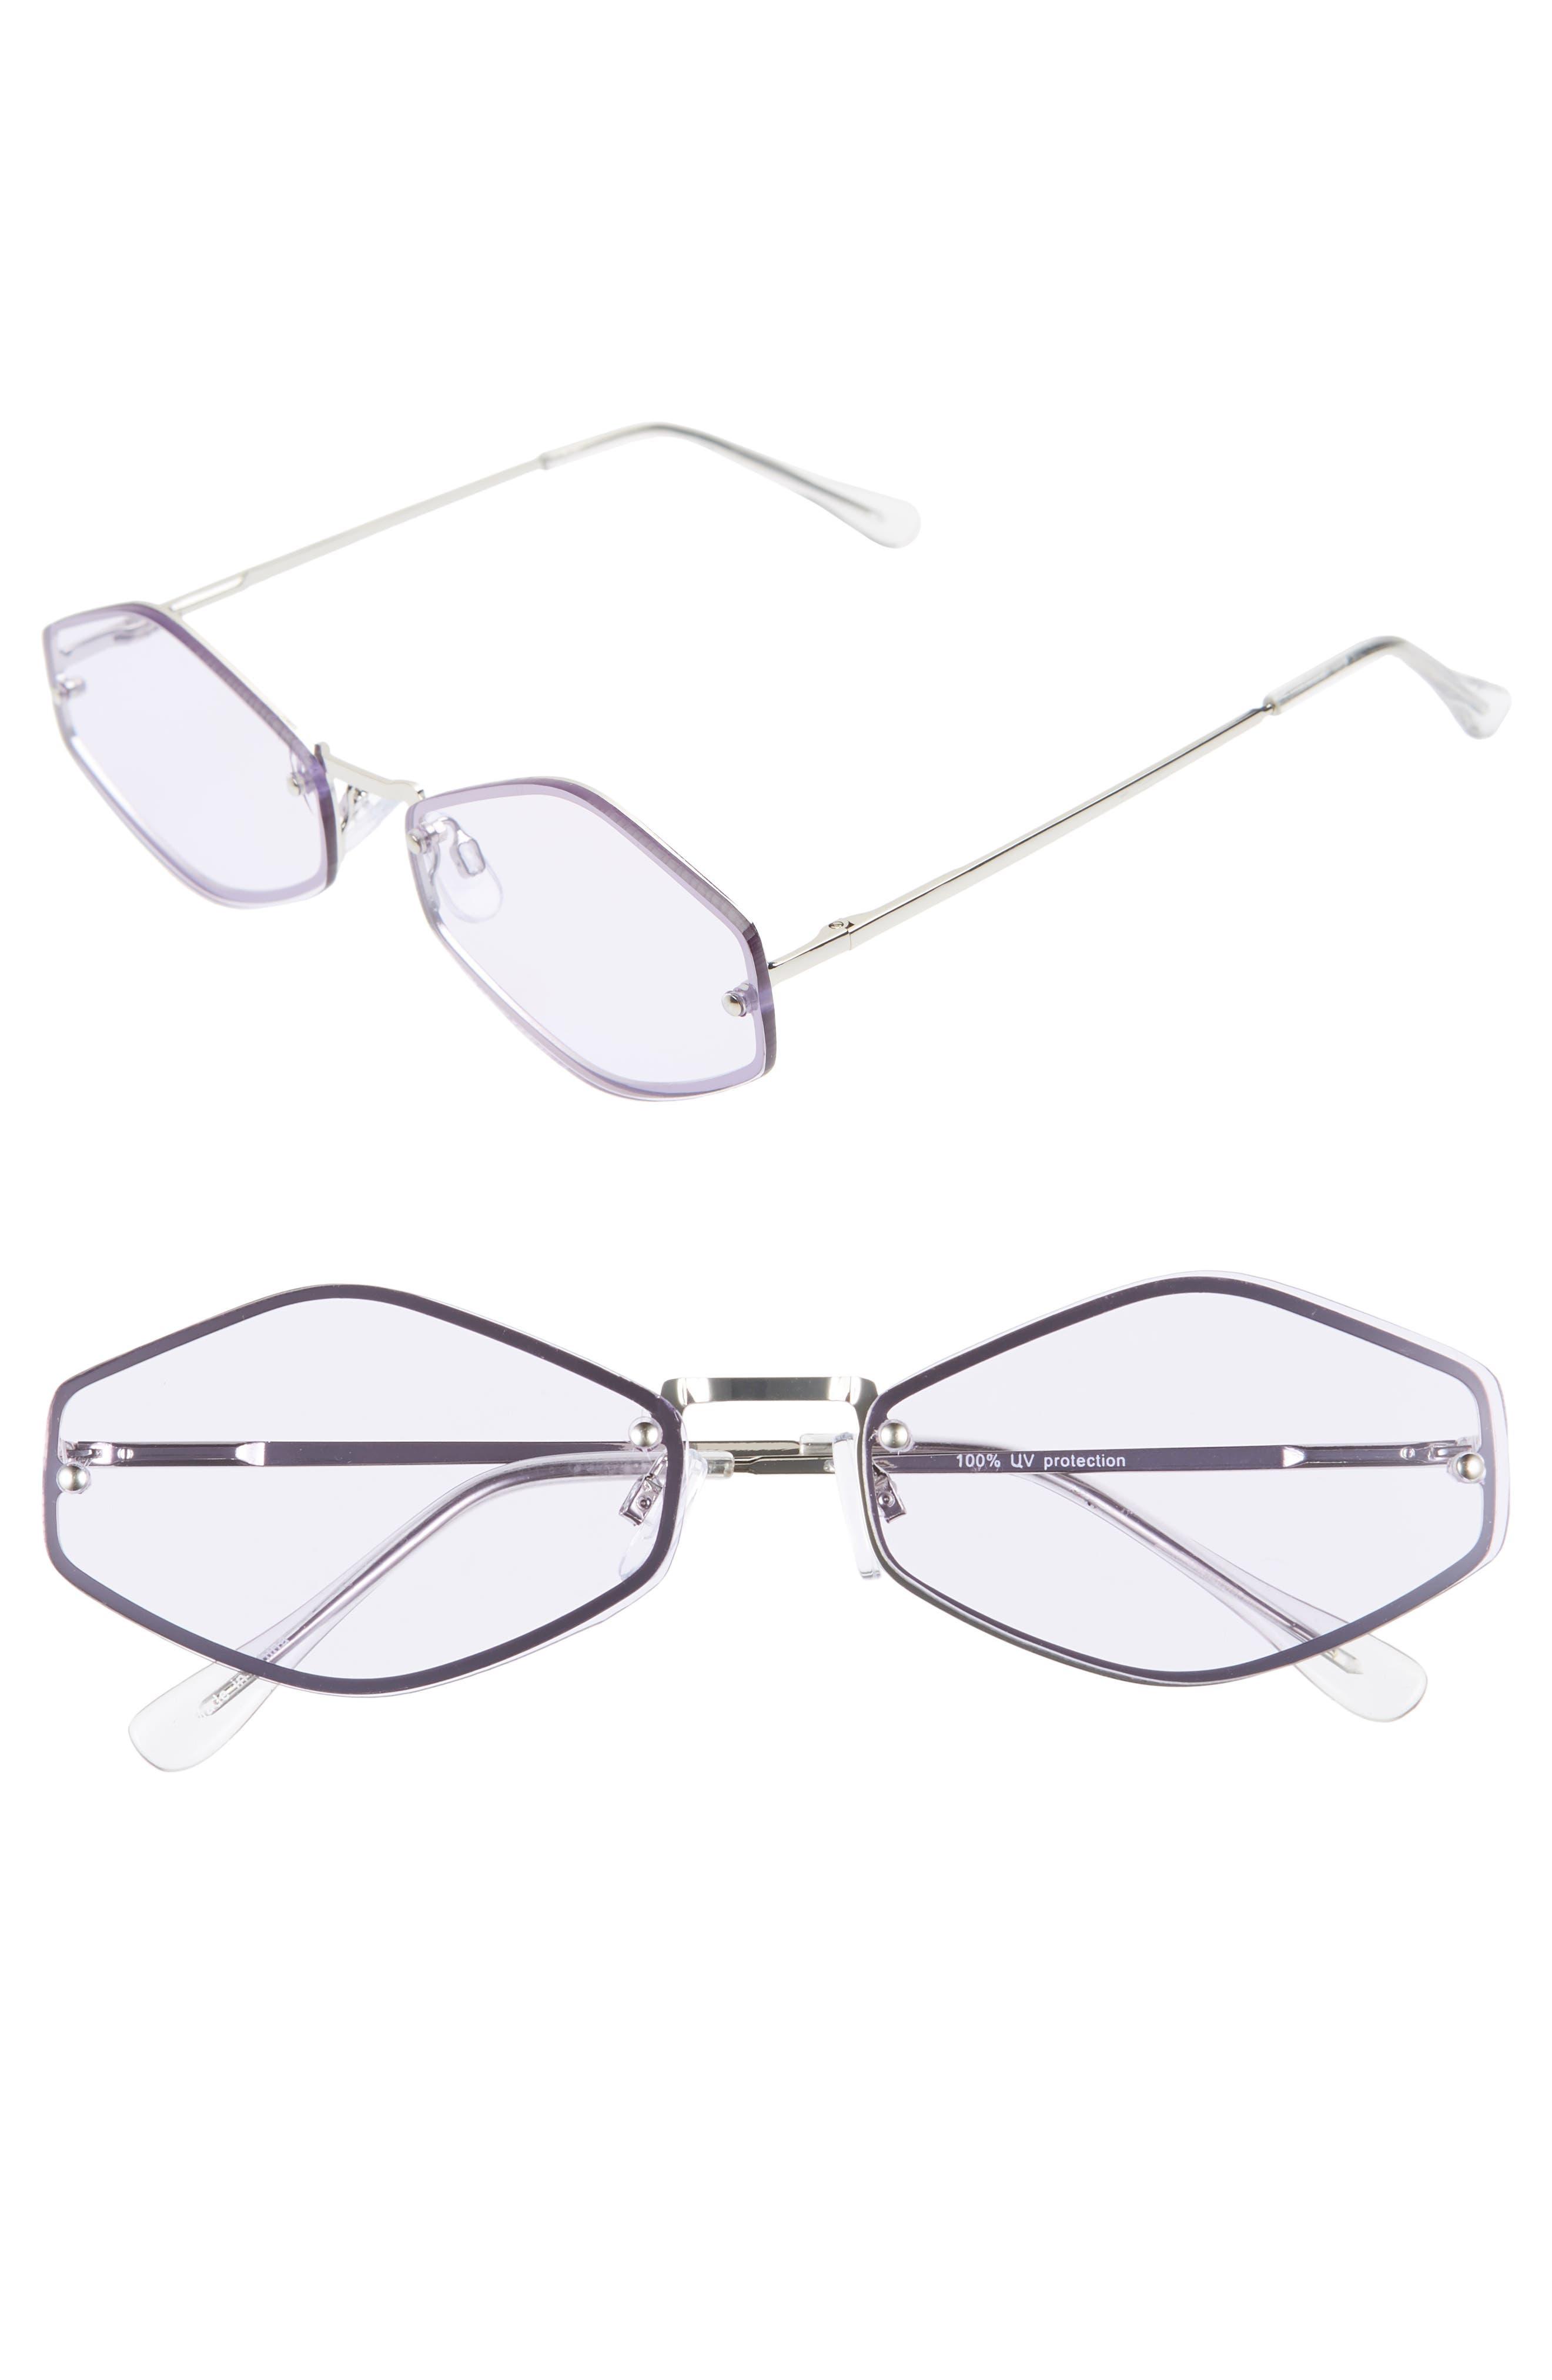 LEITH, 62mm Rimless Geometric Sunglasses, Main thumbnail 1, color, SILVER/ PURPLE